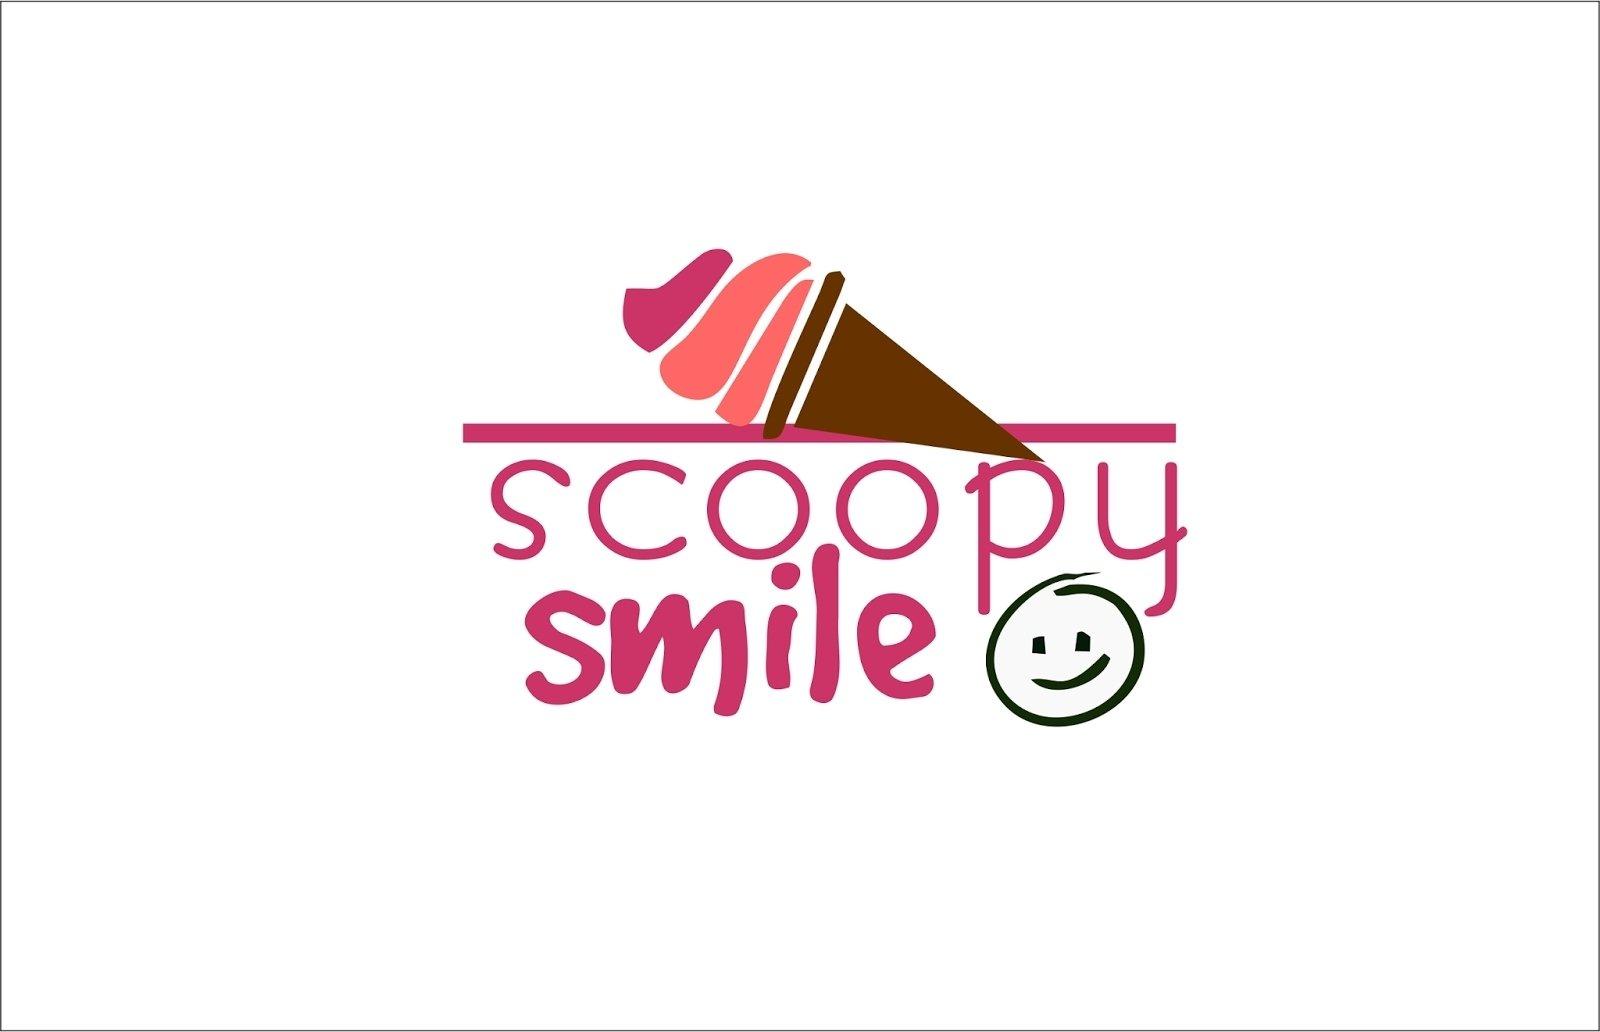 10 Fabulous Ice Cream Shop Name Ideas logo design for ice cream company luxury 21 best icecream shop names 2021